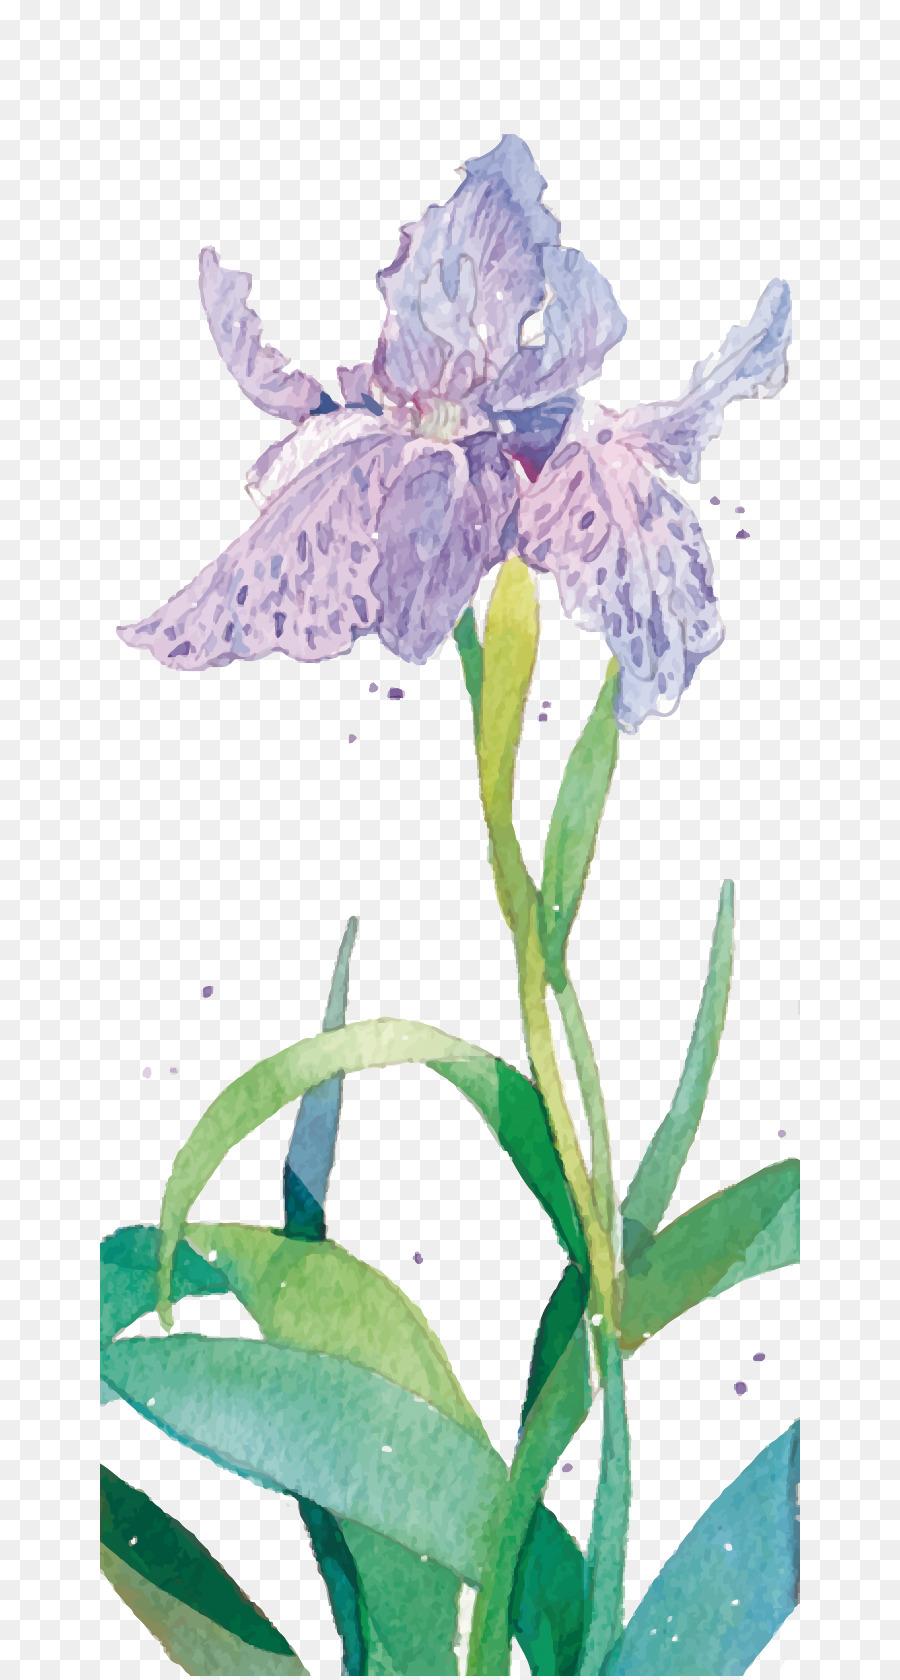 Purple watercolor painting flower purple flowers png download purple watercolor painting flower purple flowers izmirmasajfo